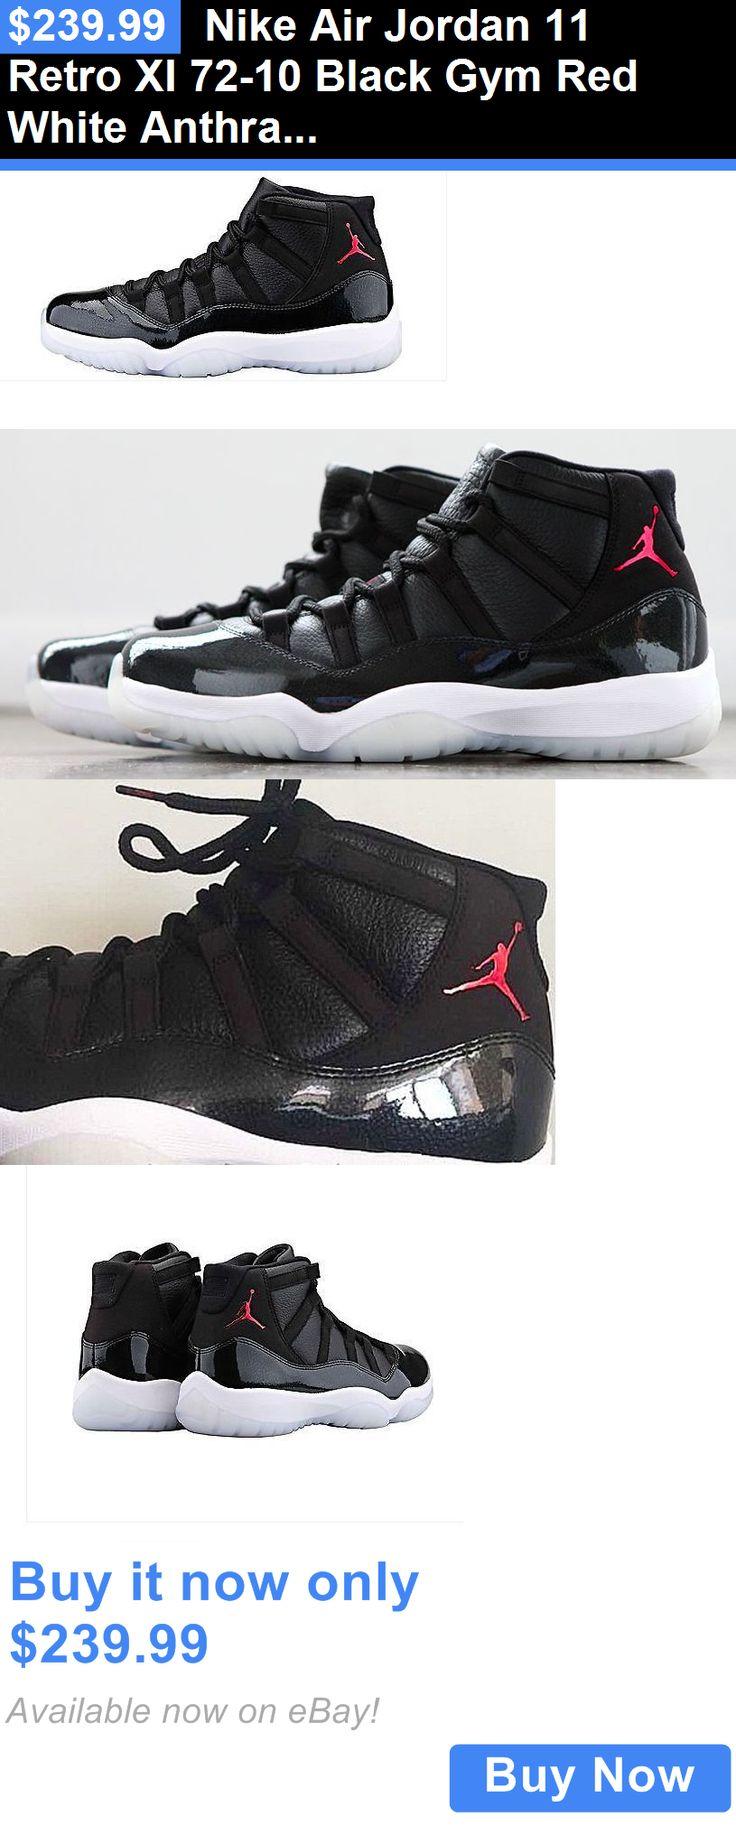 Basketball: Nike Air Jordan 11 Retro Xi 72-10 Black Gym Red White Anthracite 378037-002 BUY IT NOW ONLY: $239.99